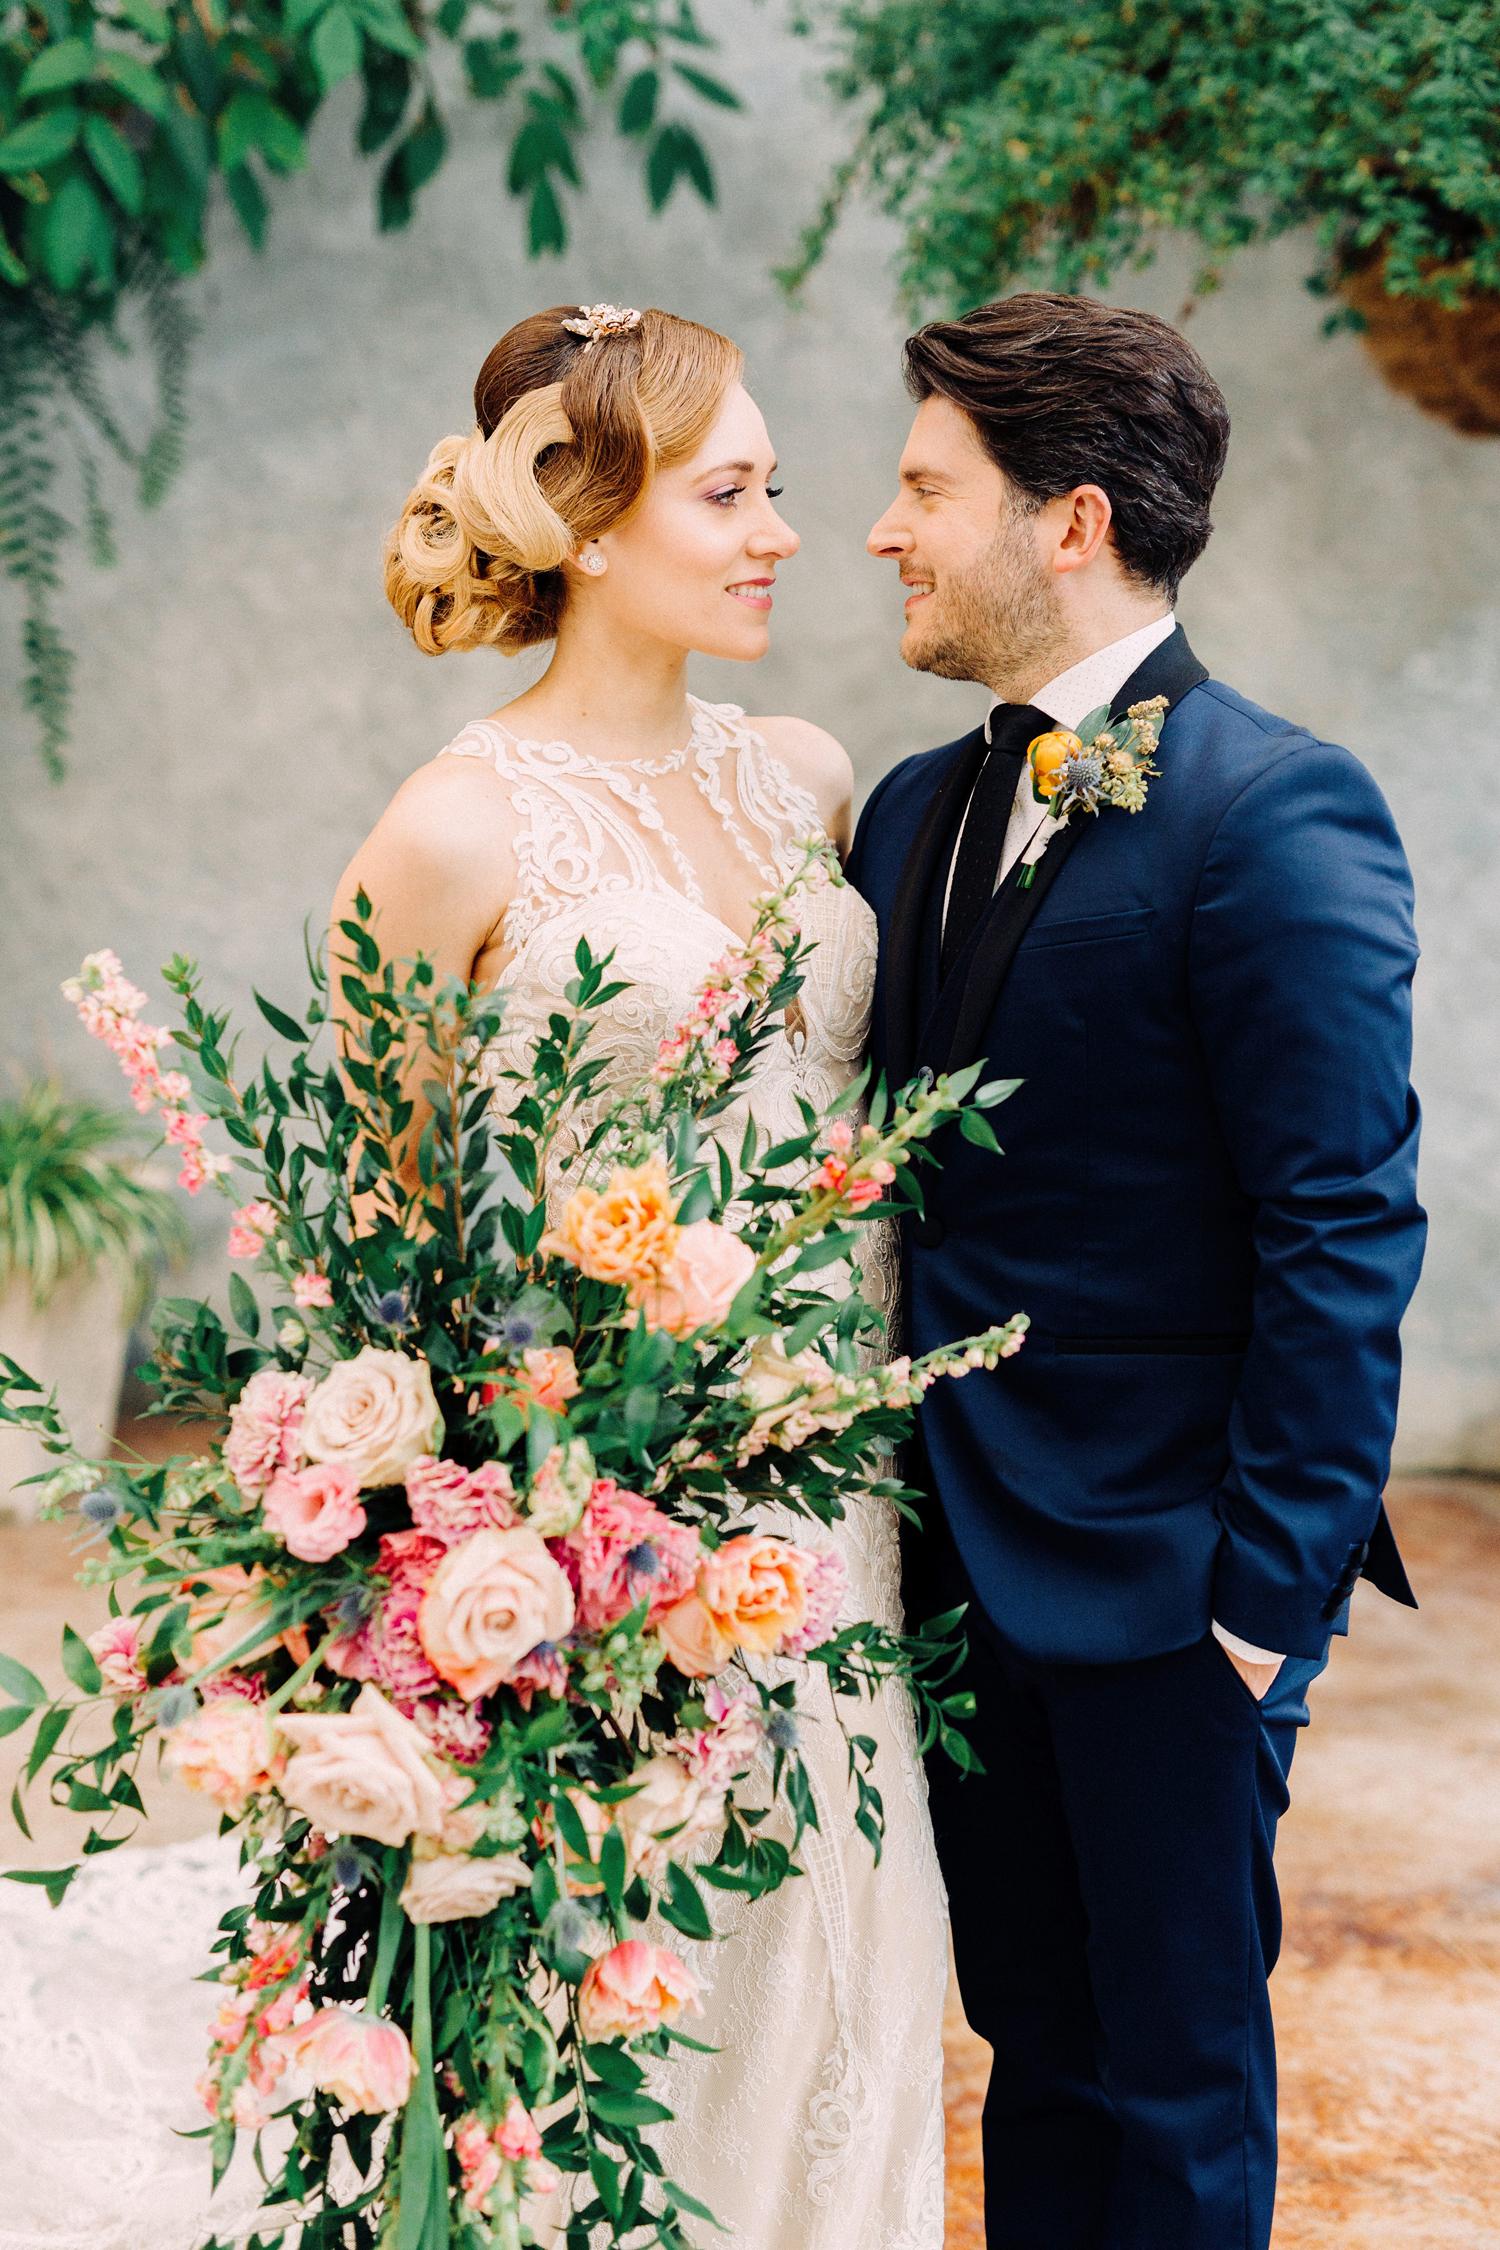 044-alaamarzouk-alaamarzoukphotography-mcallenweddingphotographer-alaa-marzouk-mcallen-mission-wedding-texas-venue-photography-wedding-california-bride-bridal-engagement-austin-elopement.jpg